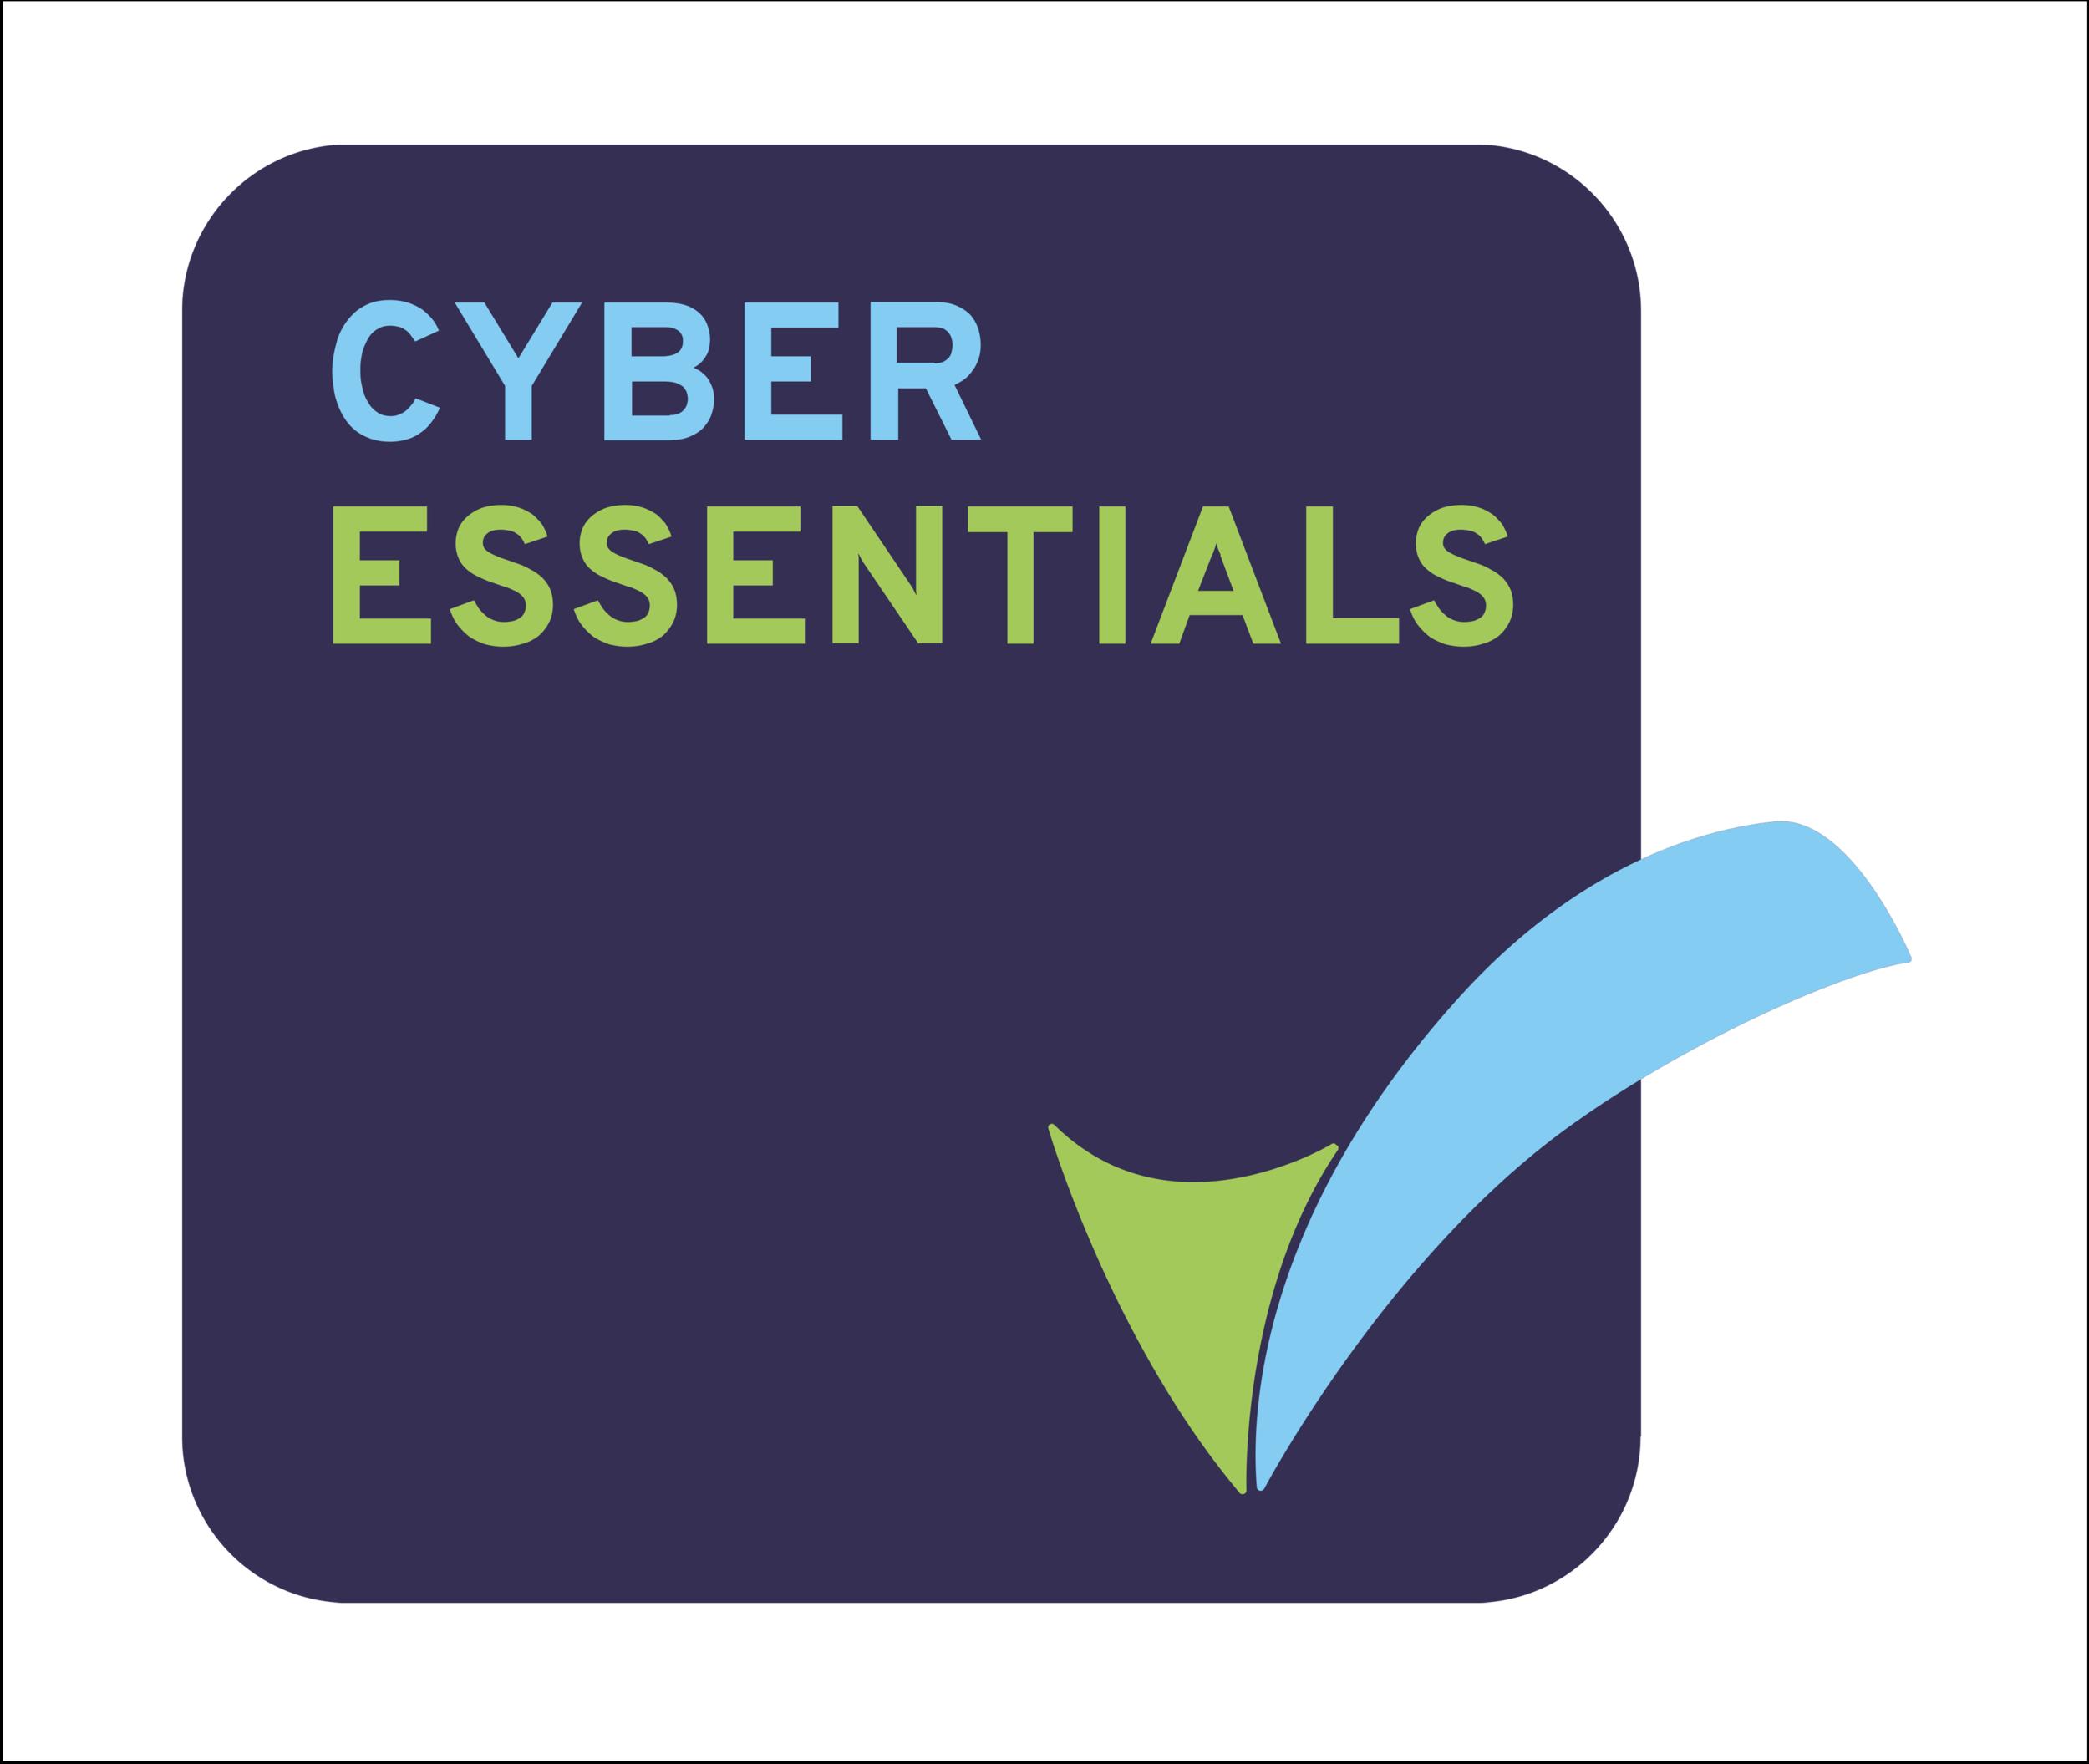 cyber-essentials-badge-high-res copy wbg.png